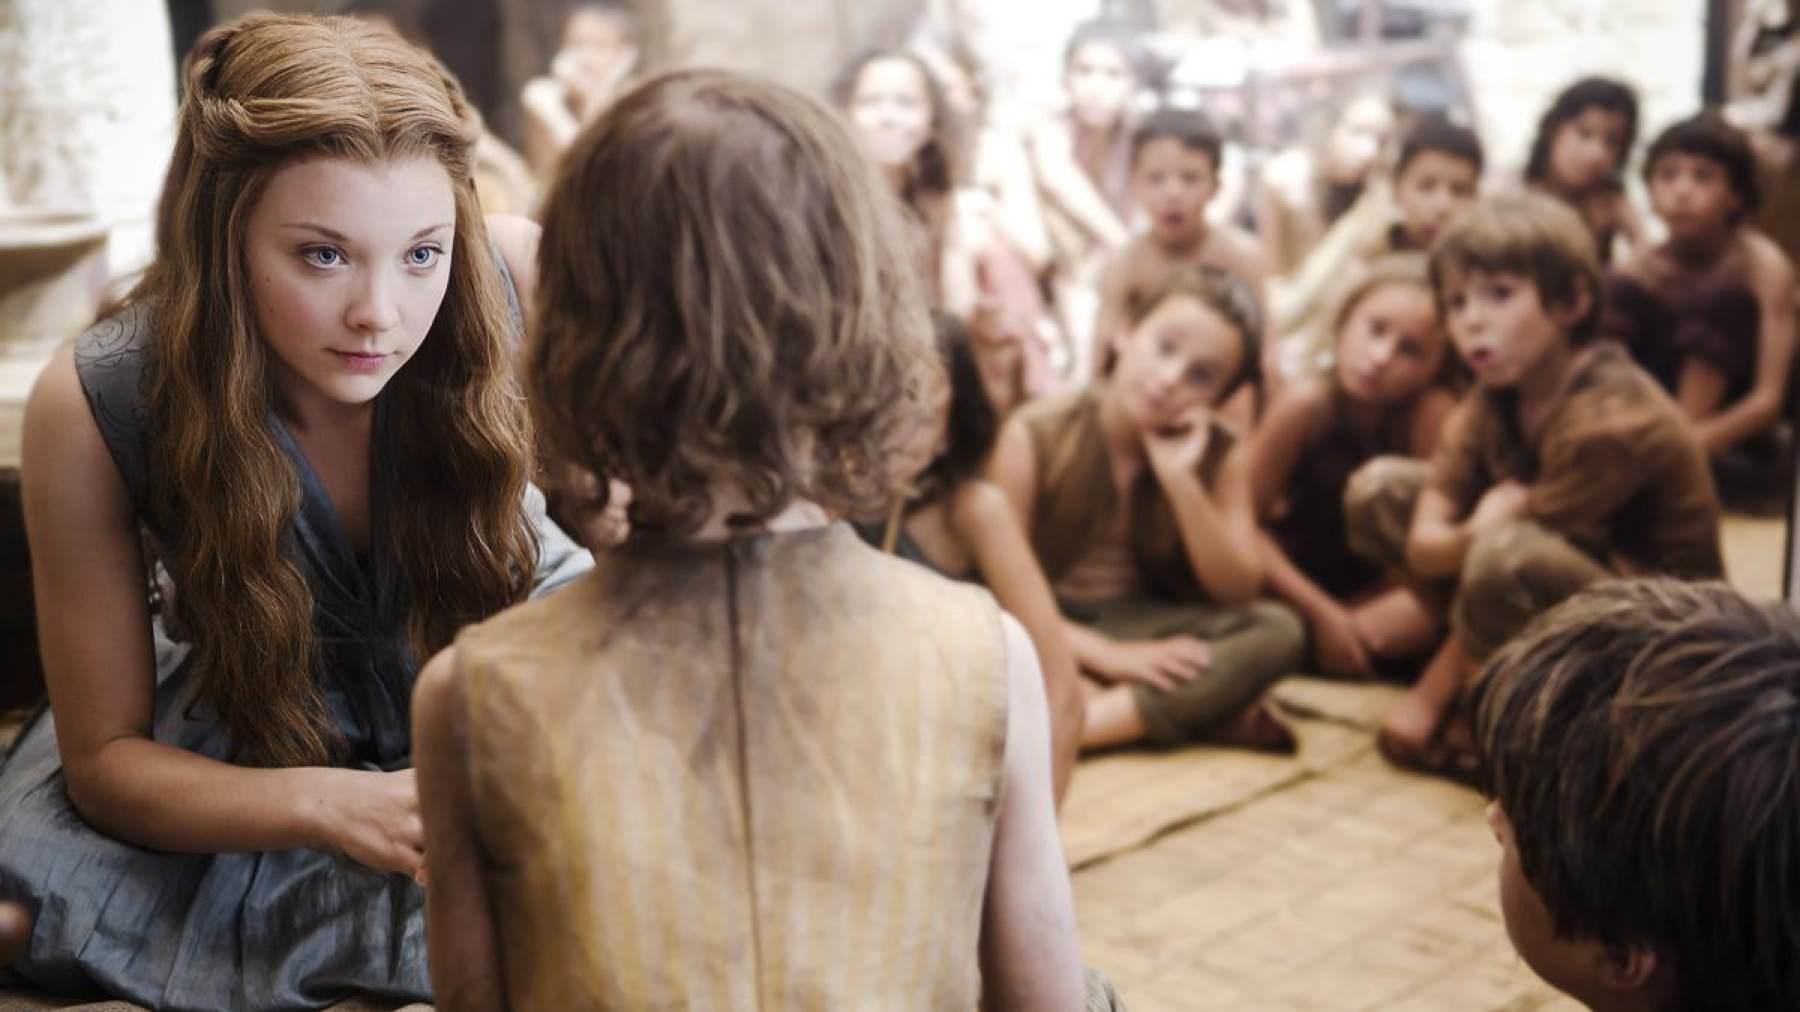 Margaery Tyrell Margaery Tyrell Season 3Natalie Dormer Margaery Tyrell Season 3